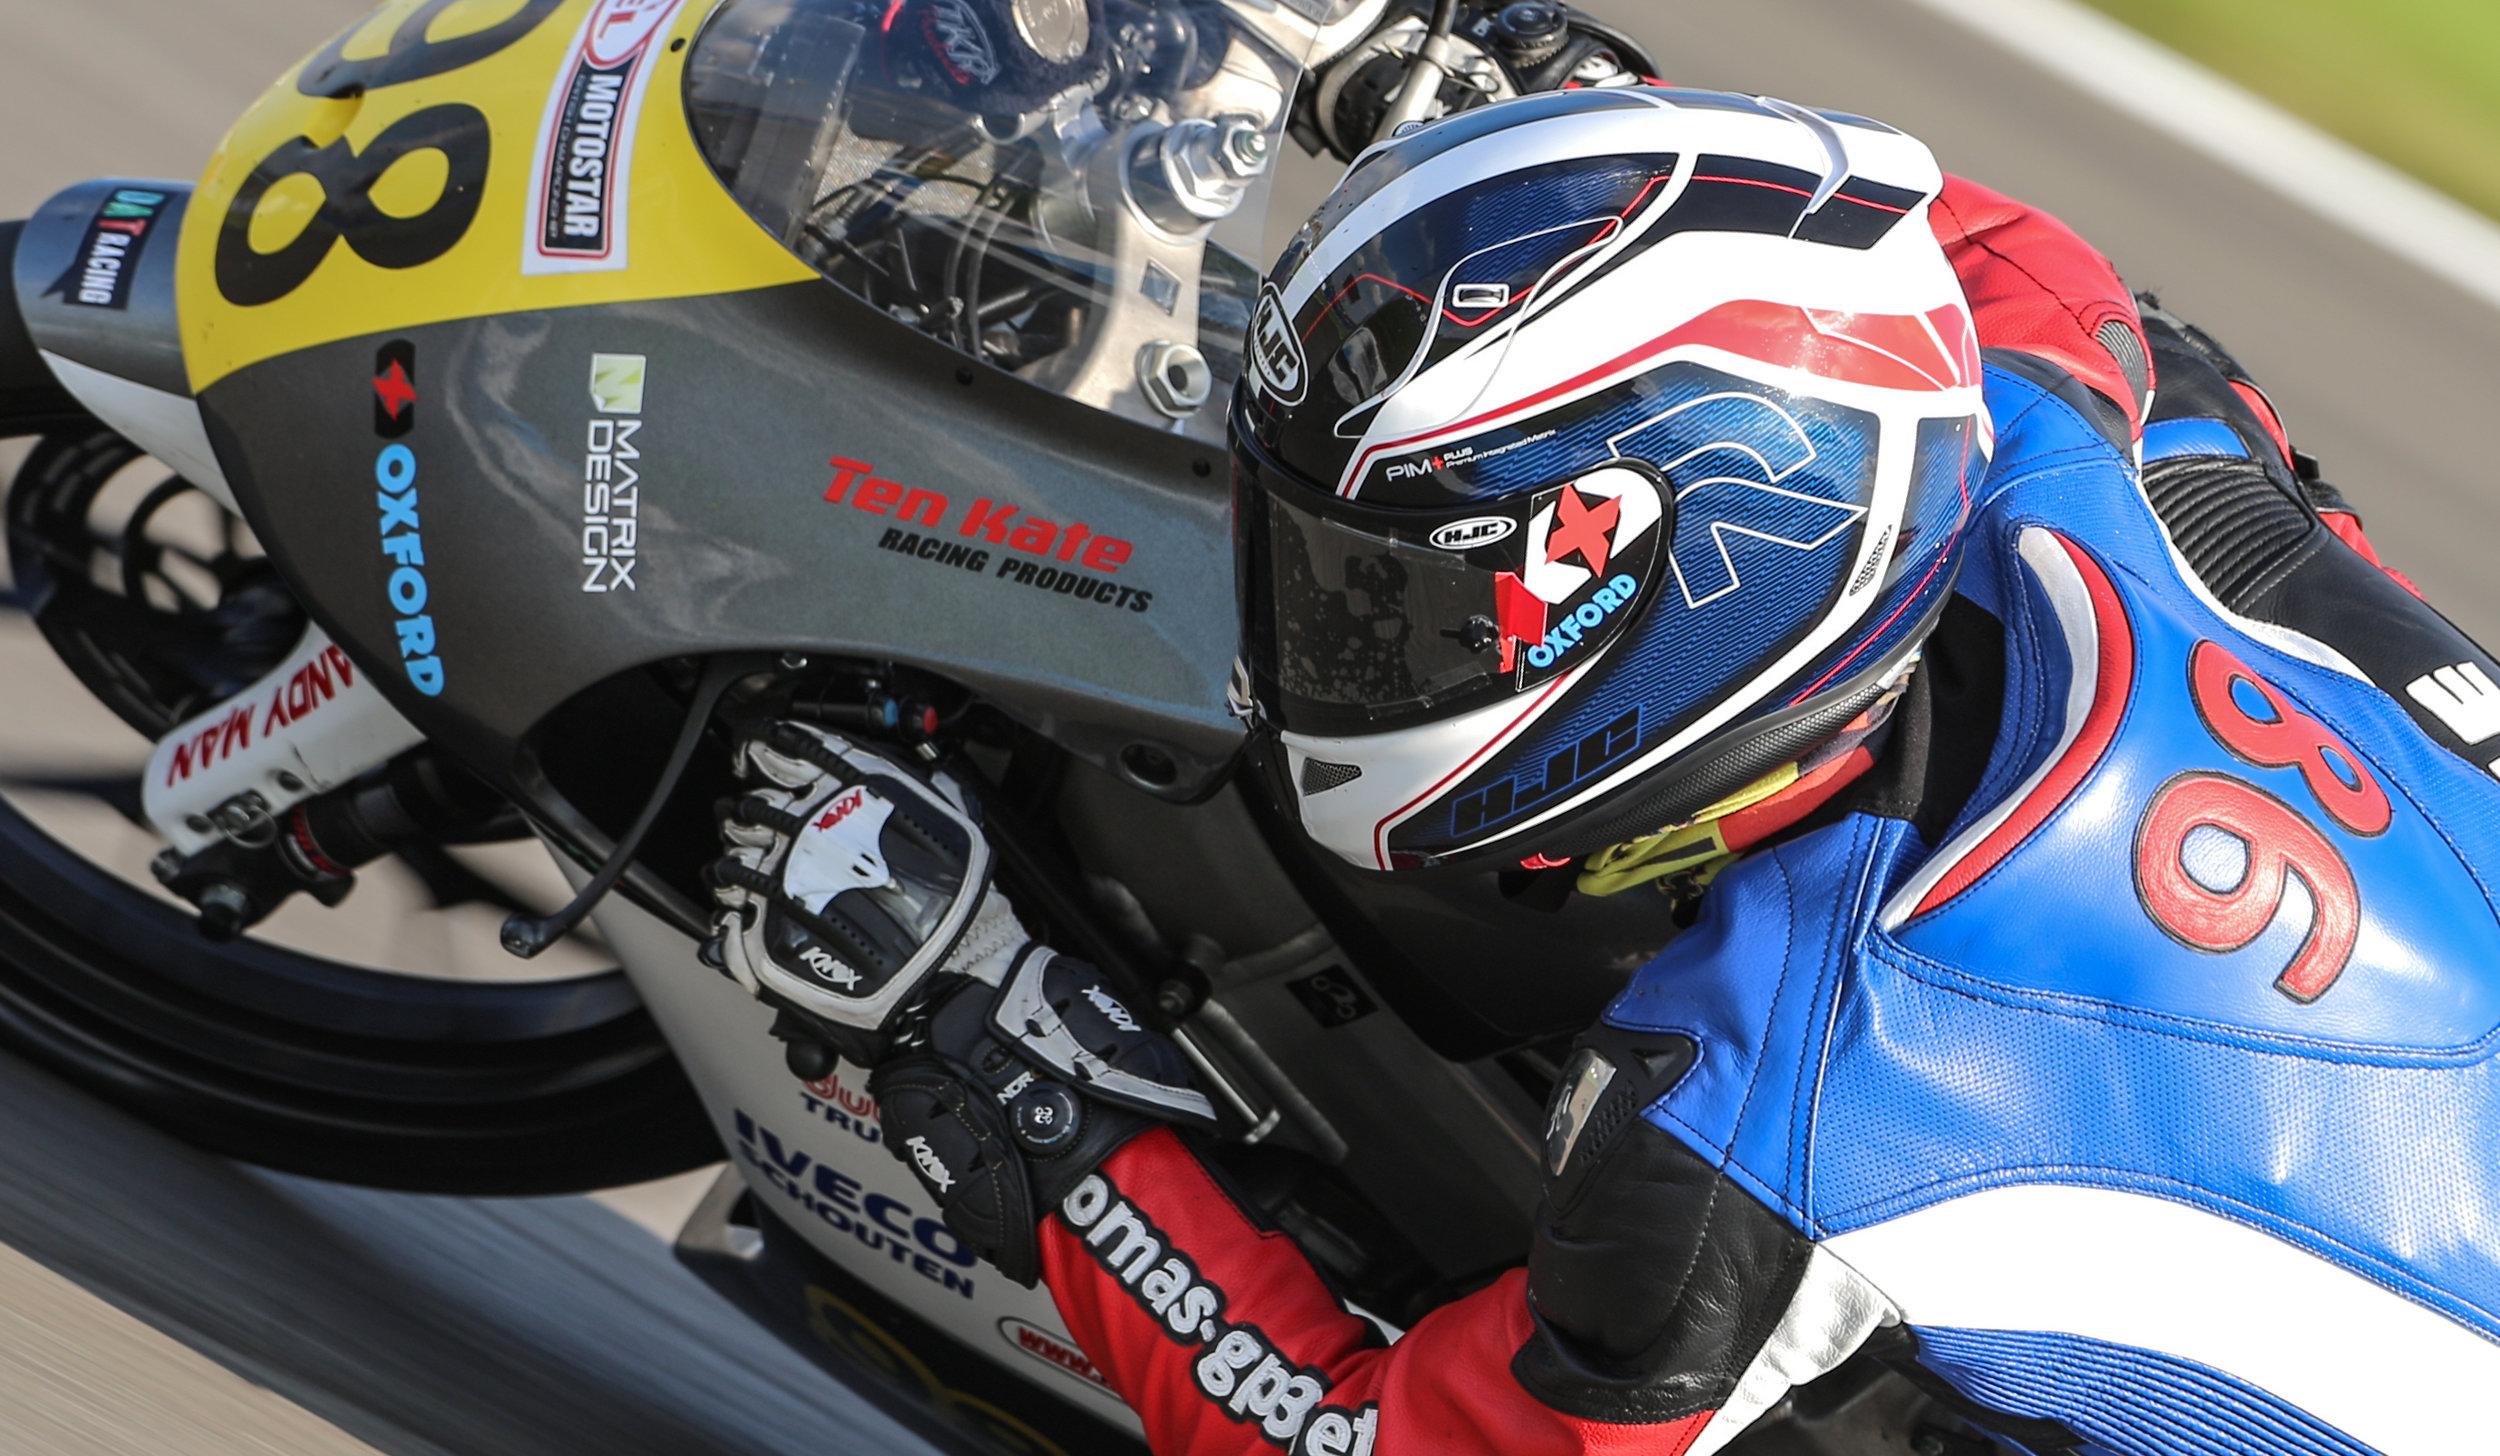 Close Up! Photo credit: Christopher Brown - Raceline Images